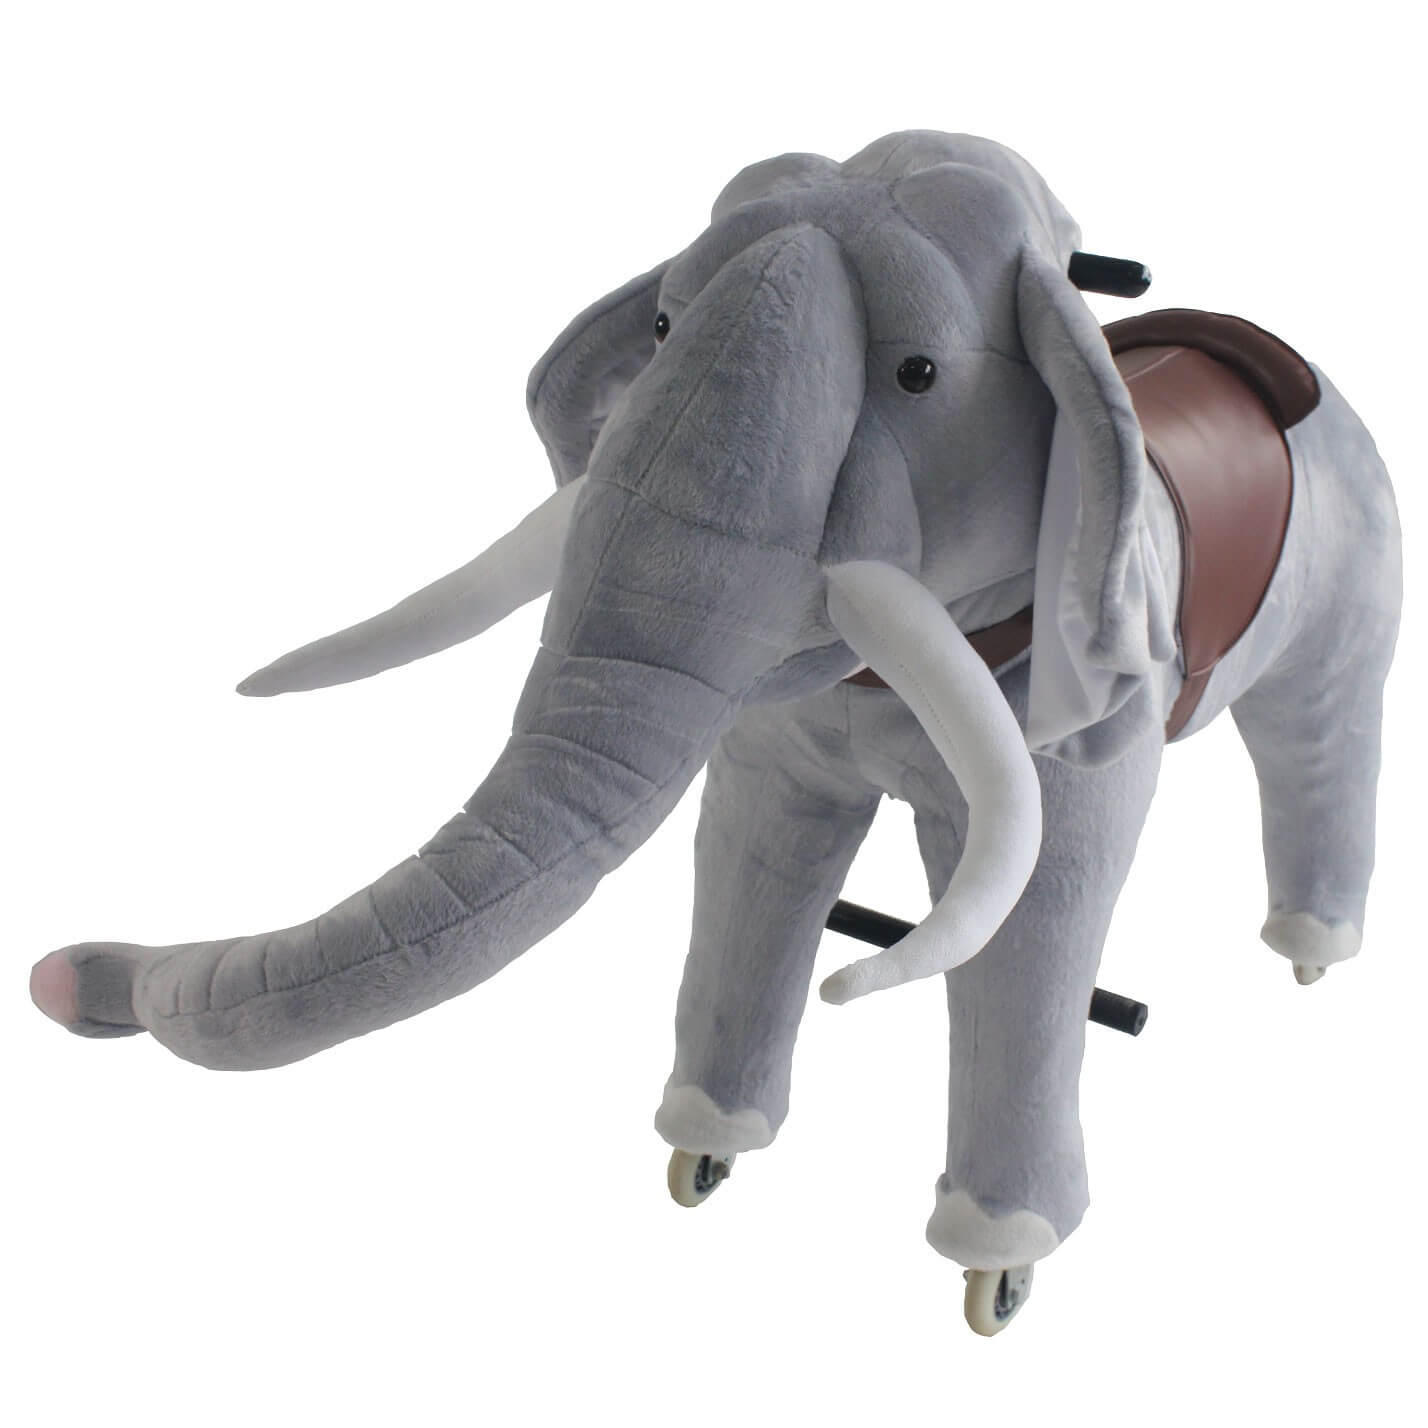 Läs mer om Elefanten Dumbo. Höjd 100 cm.